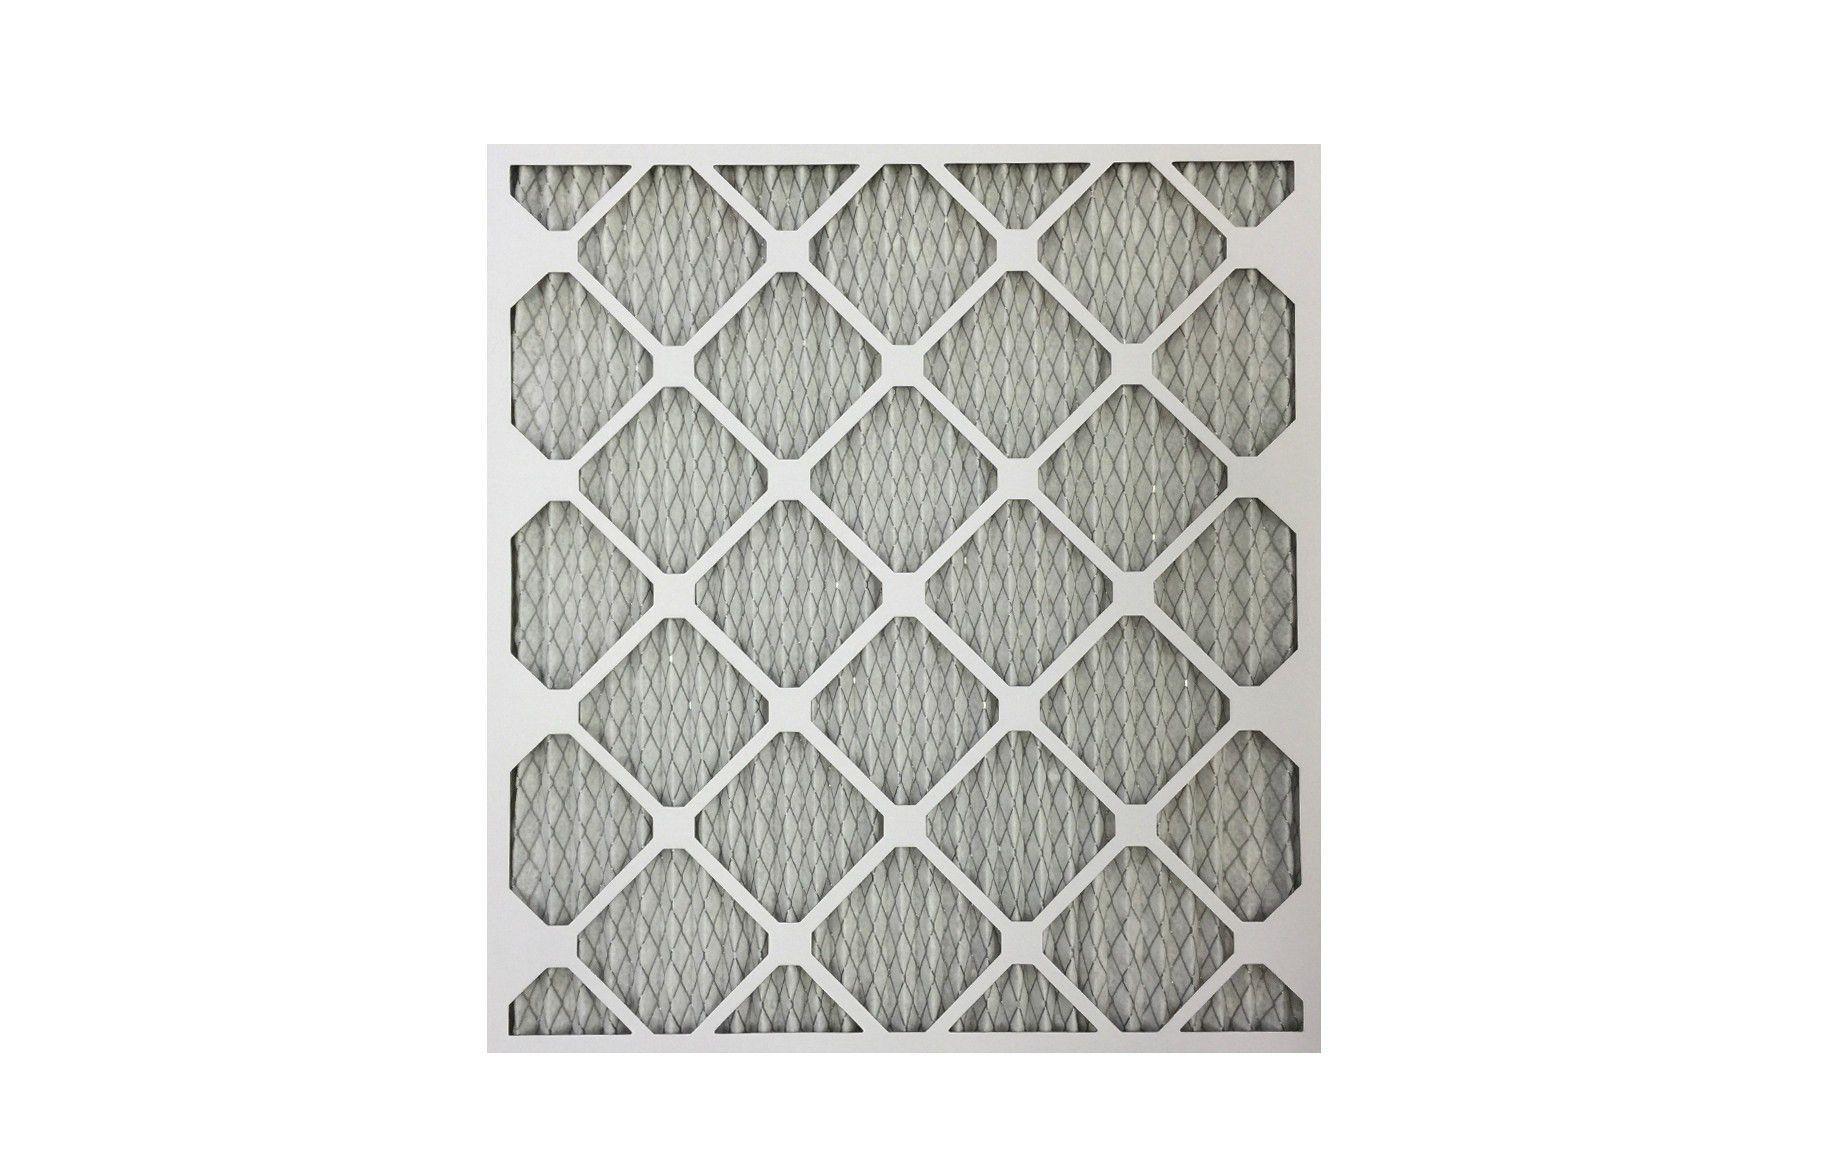 21x23x1 MERV11 Air Furnace Filter Furnace filters